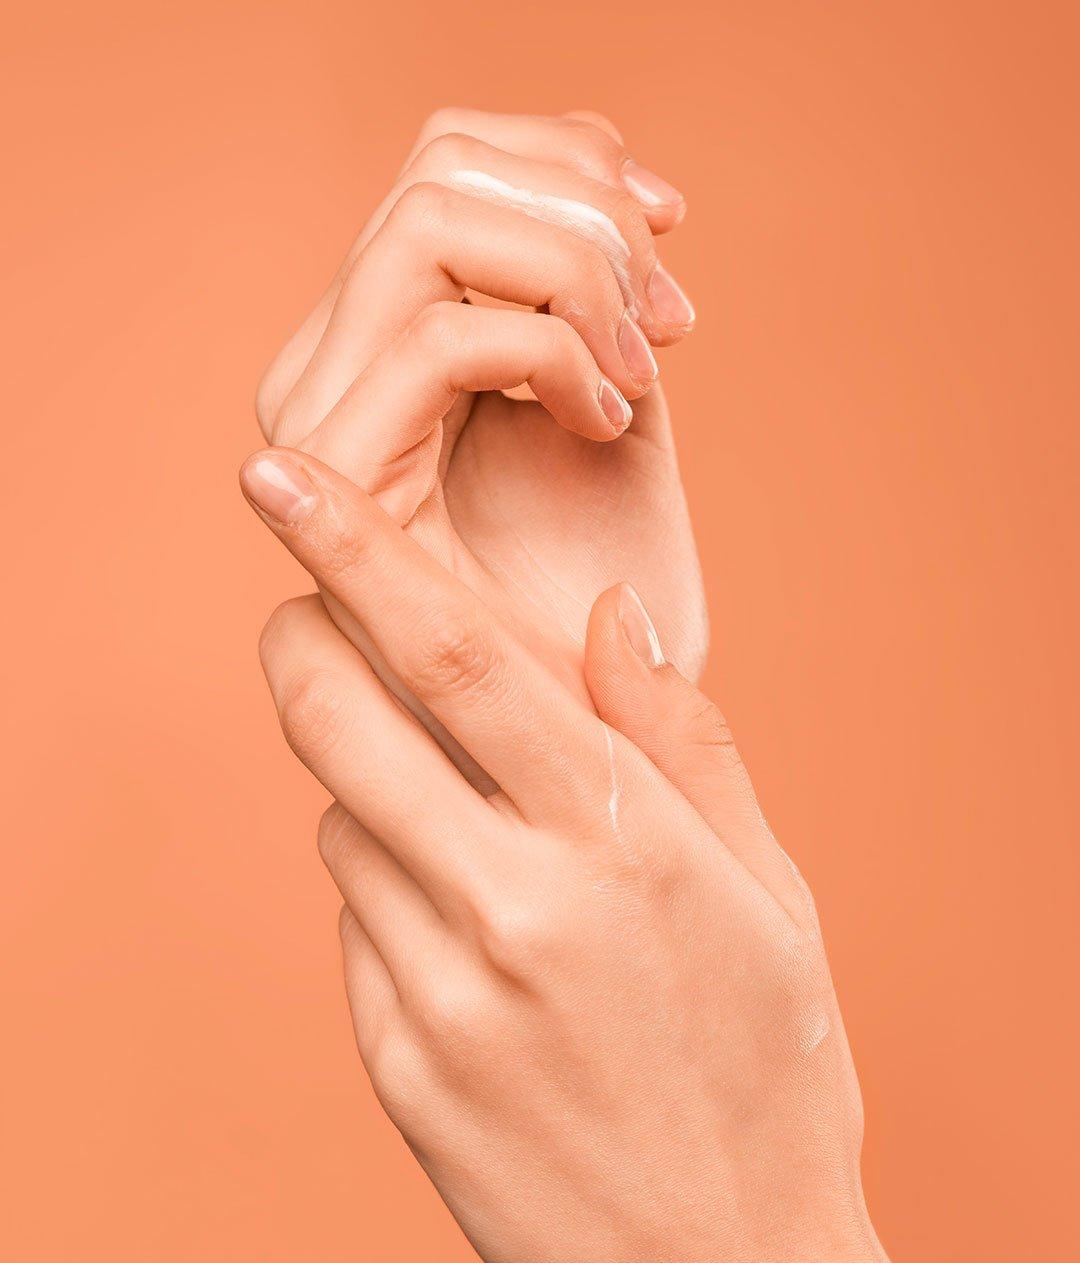 Prendre soin de ses beaux ongles